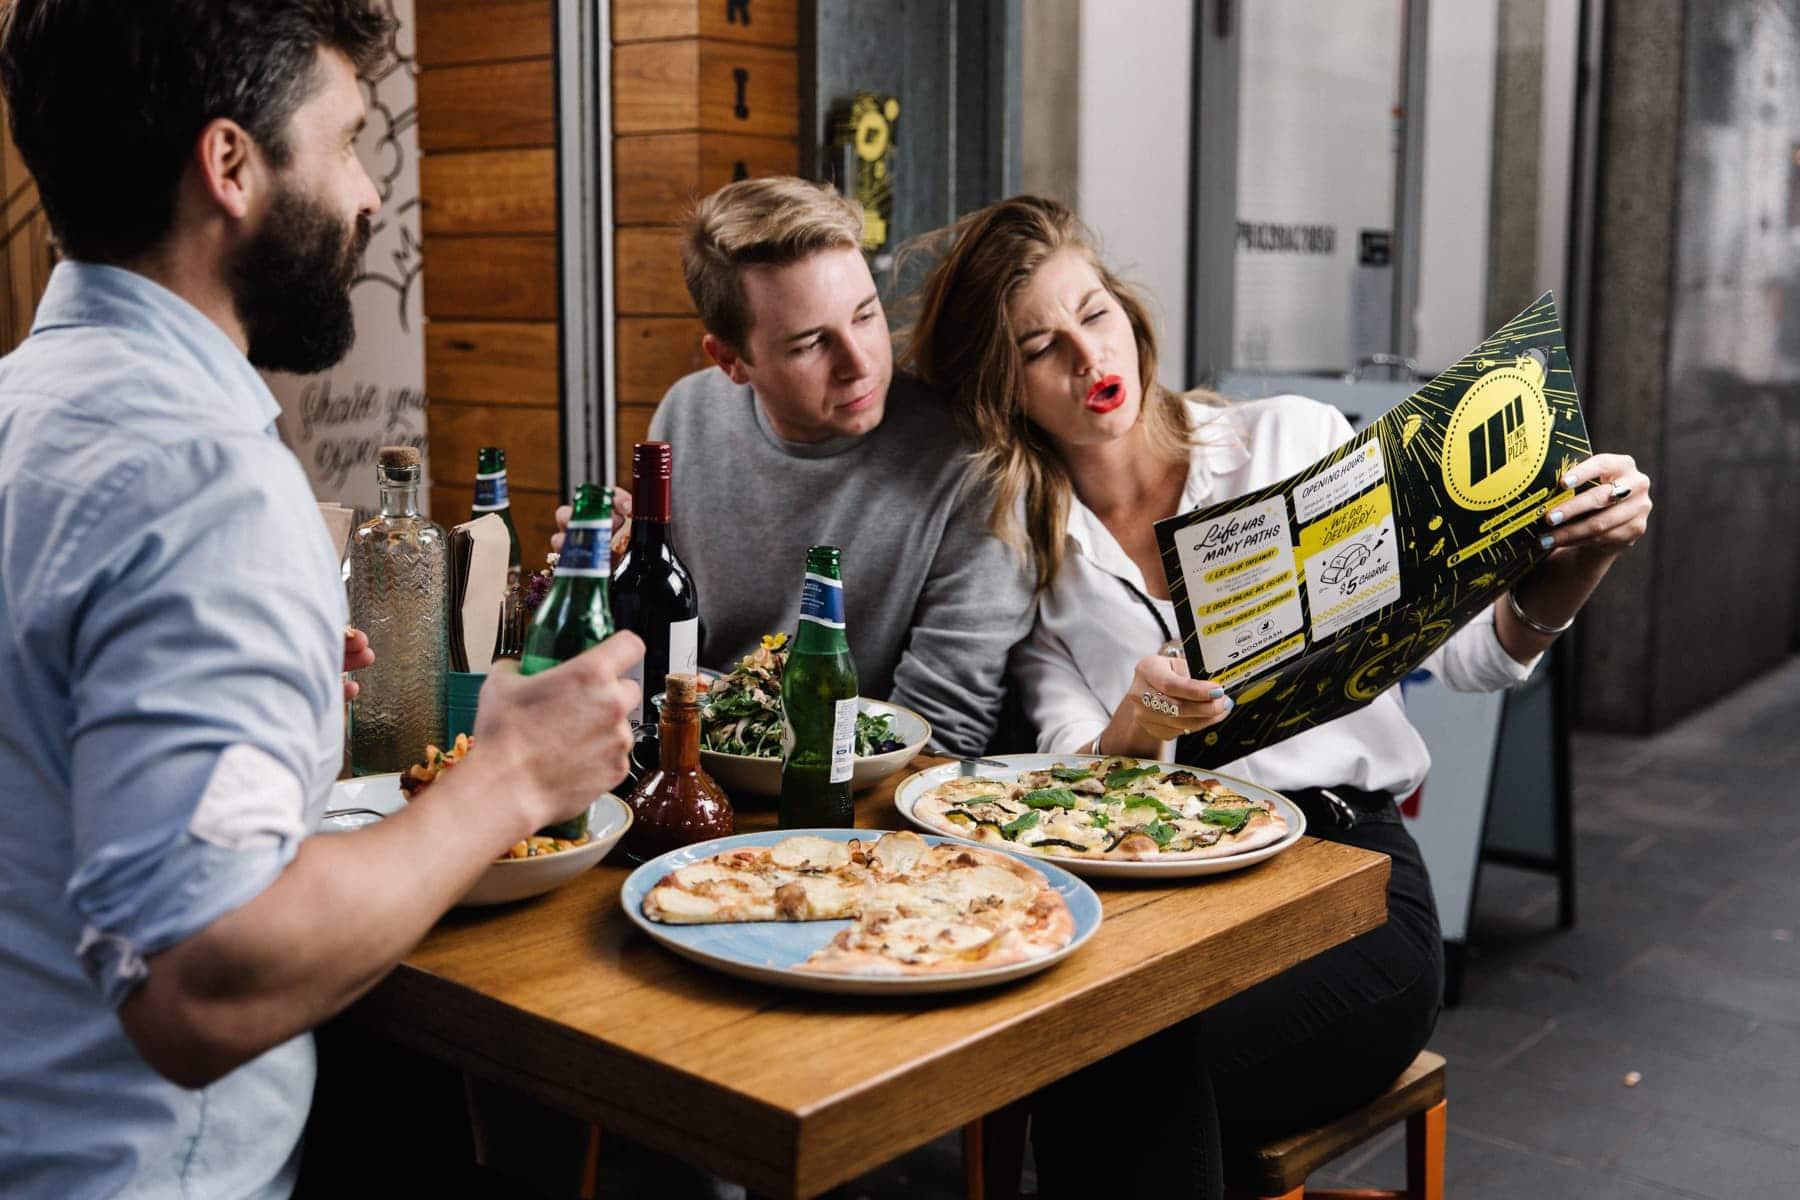 Customers sitting at a table at 11 Inch Pizza, looking at the menu